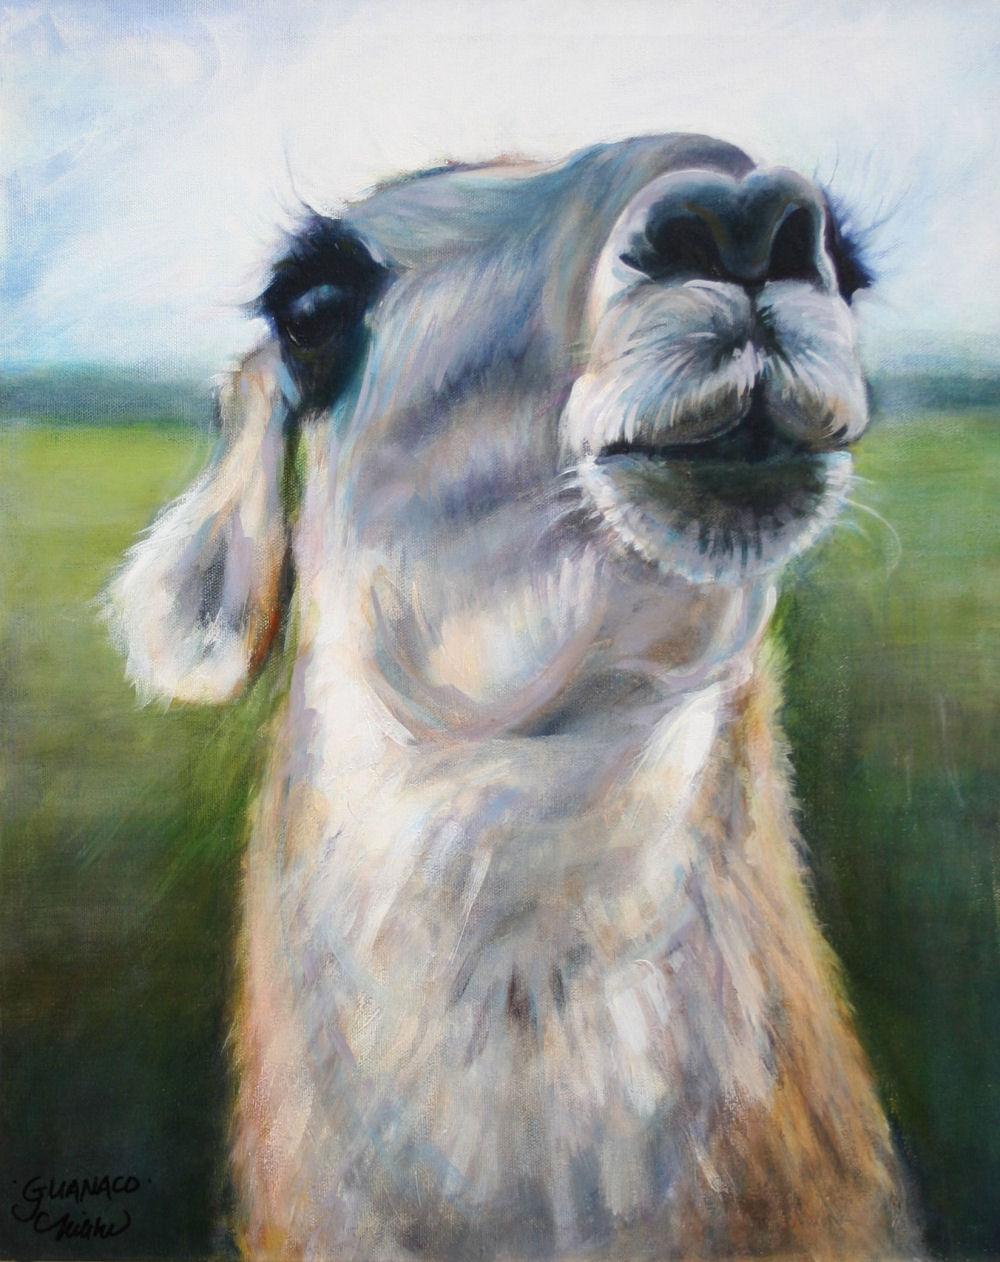 Guanaco - Fossil Rim Wildlife Park, Glenrose, Texas - 20H x 16W inches acrylics on canvas, framed